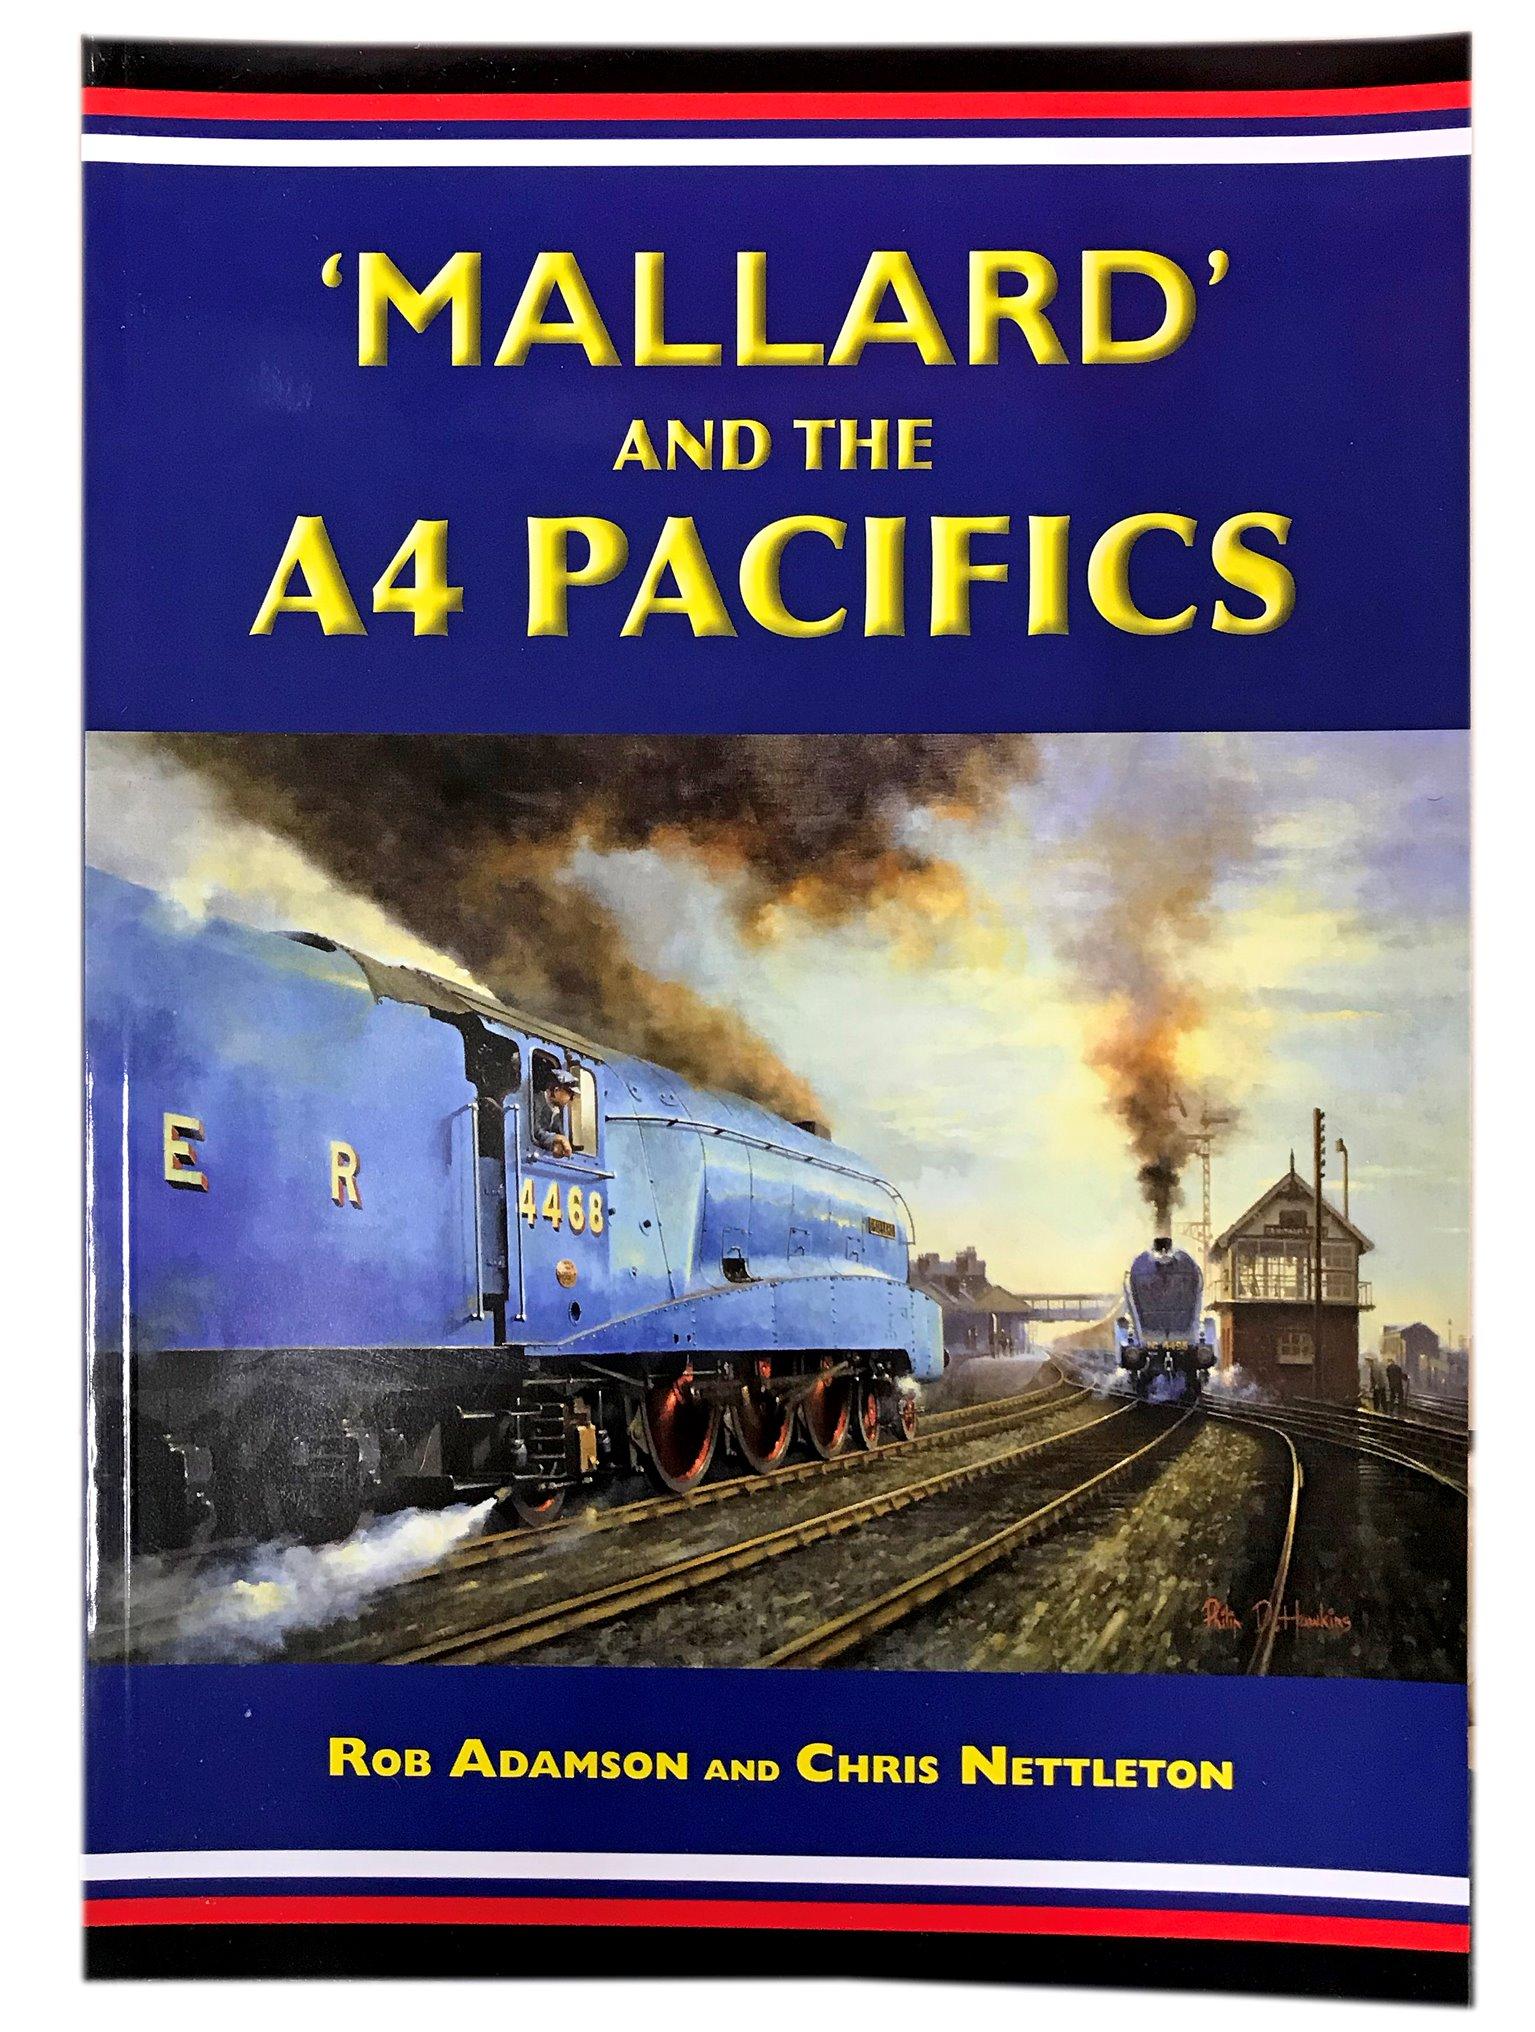 Mallard and the A4 Pacifics